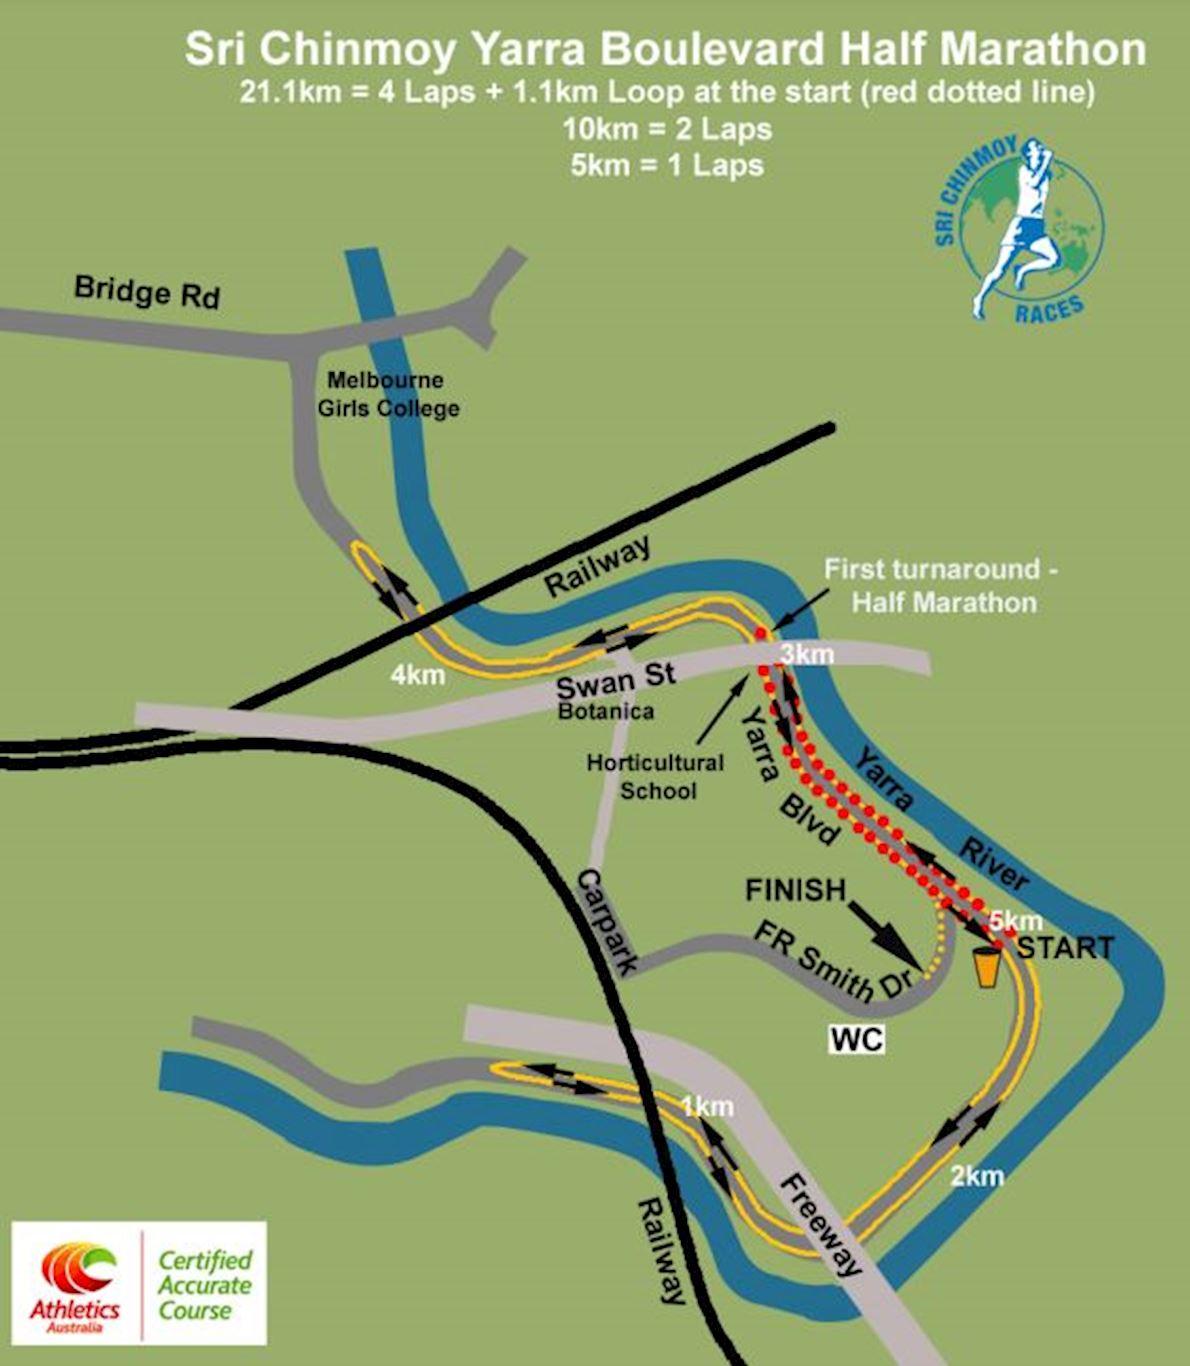 Sri Chinmoy Yarra Boulevard Half Marathon Route Map